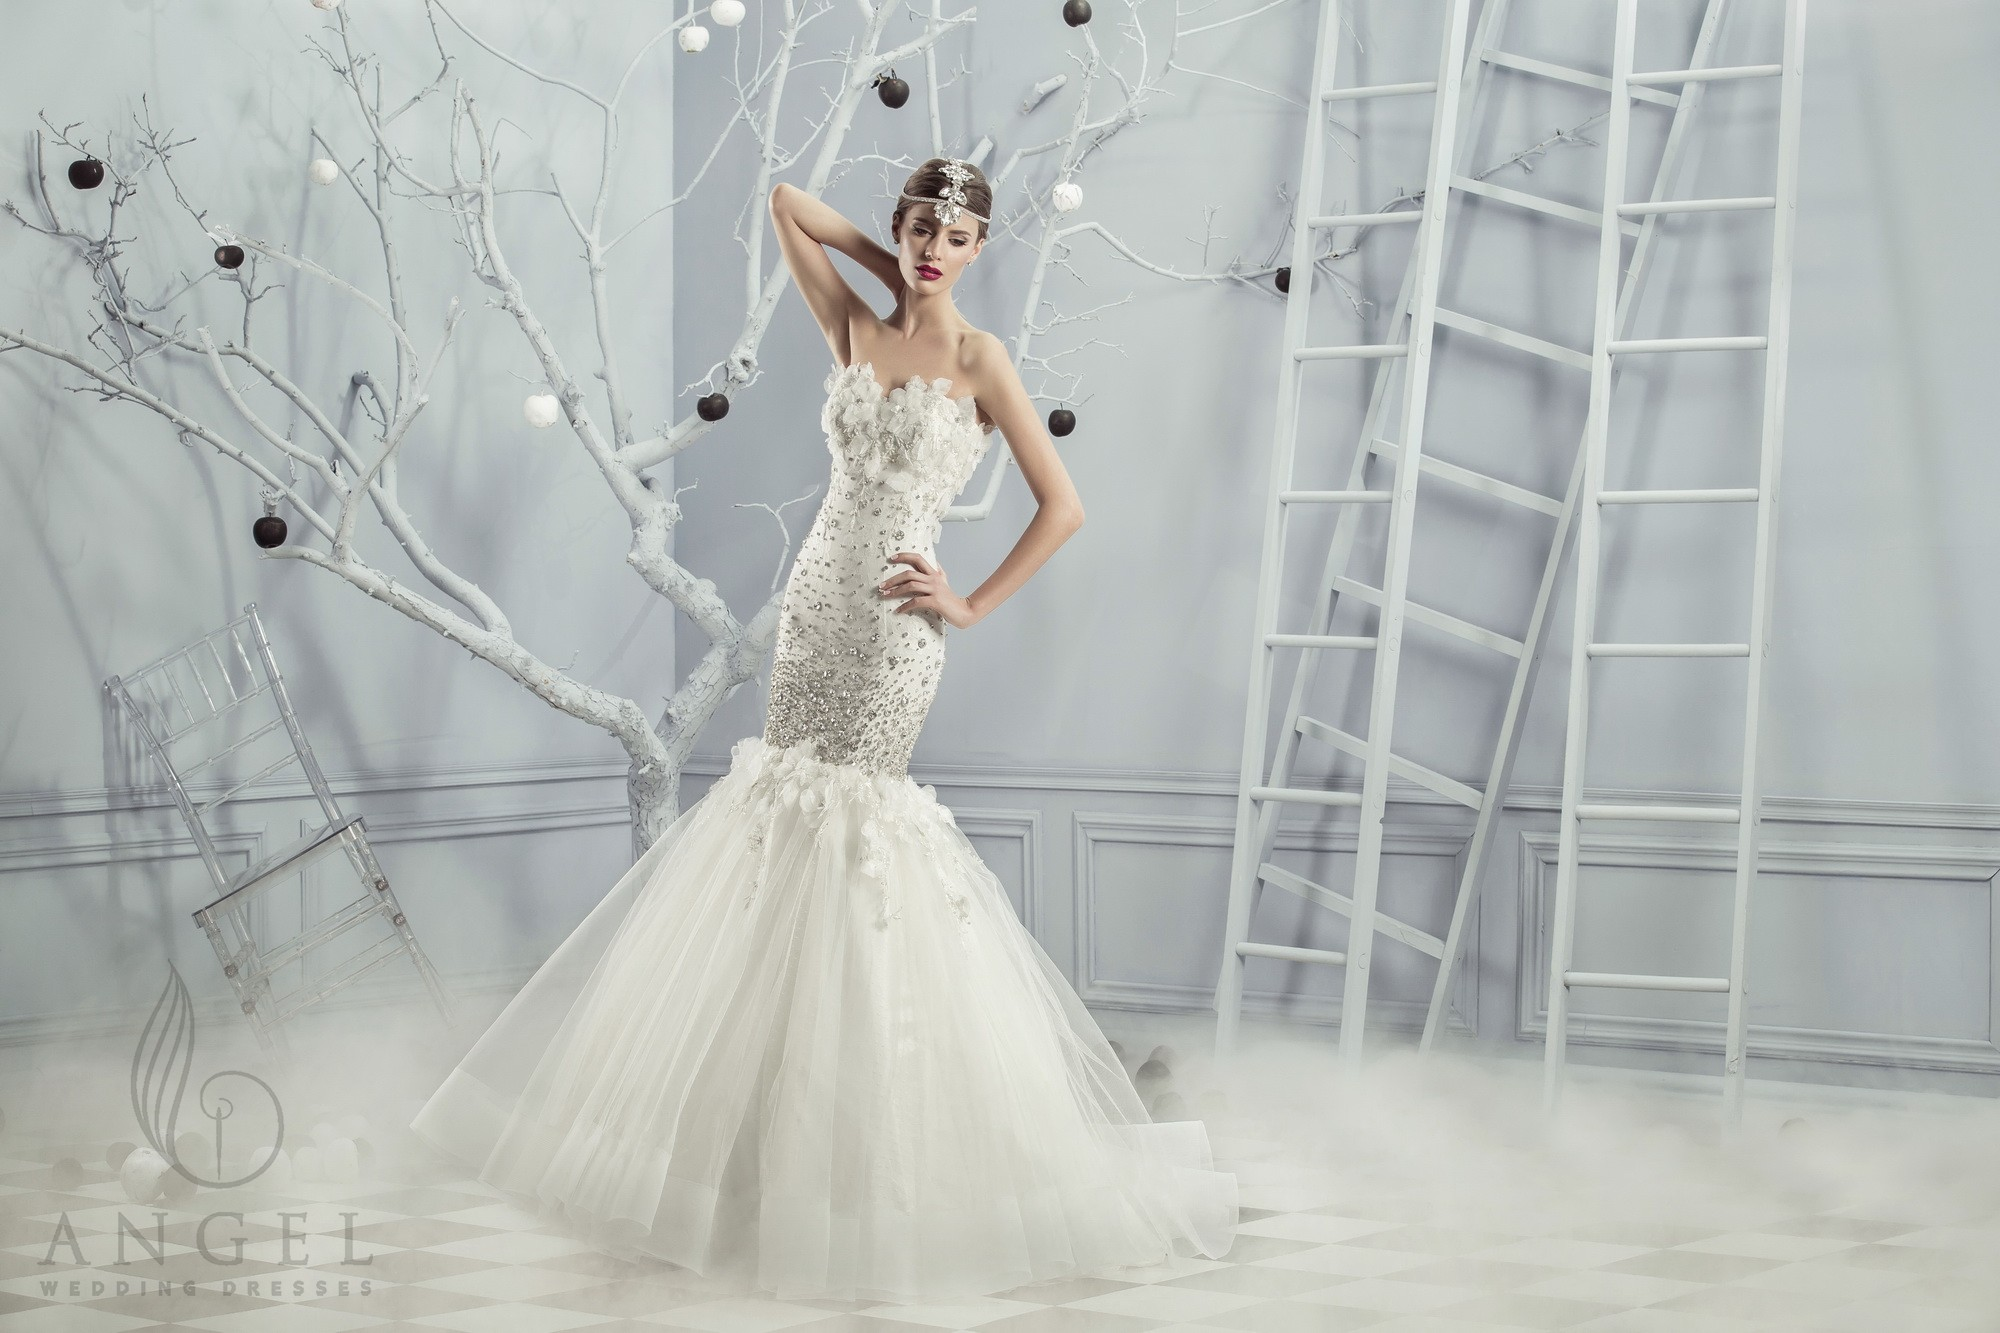 https://angel-novias.com/images/stories/virtuemart/product/Iva.jpg